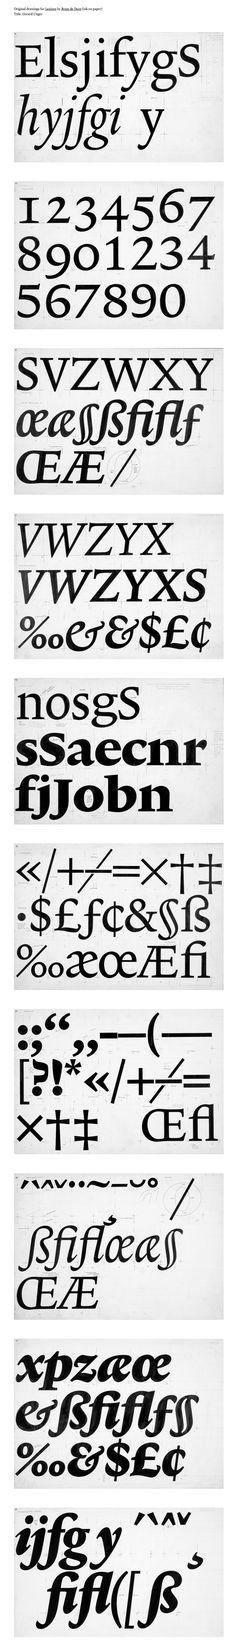 Original type sketches. (Via BDIF)